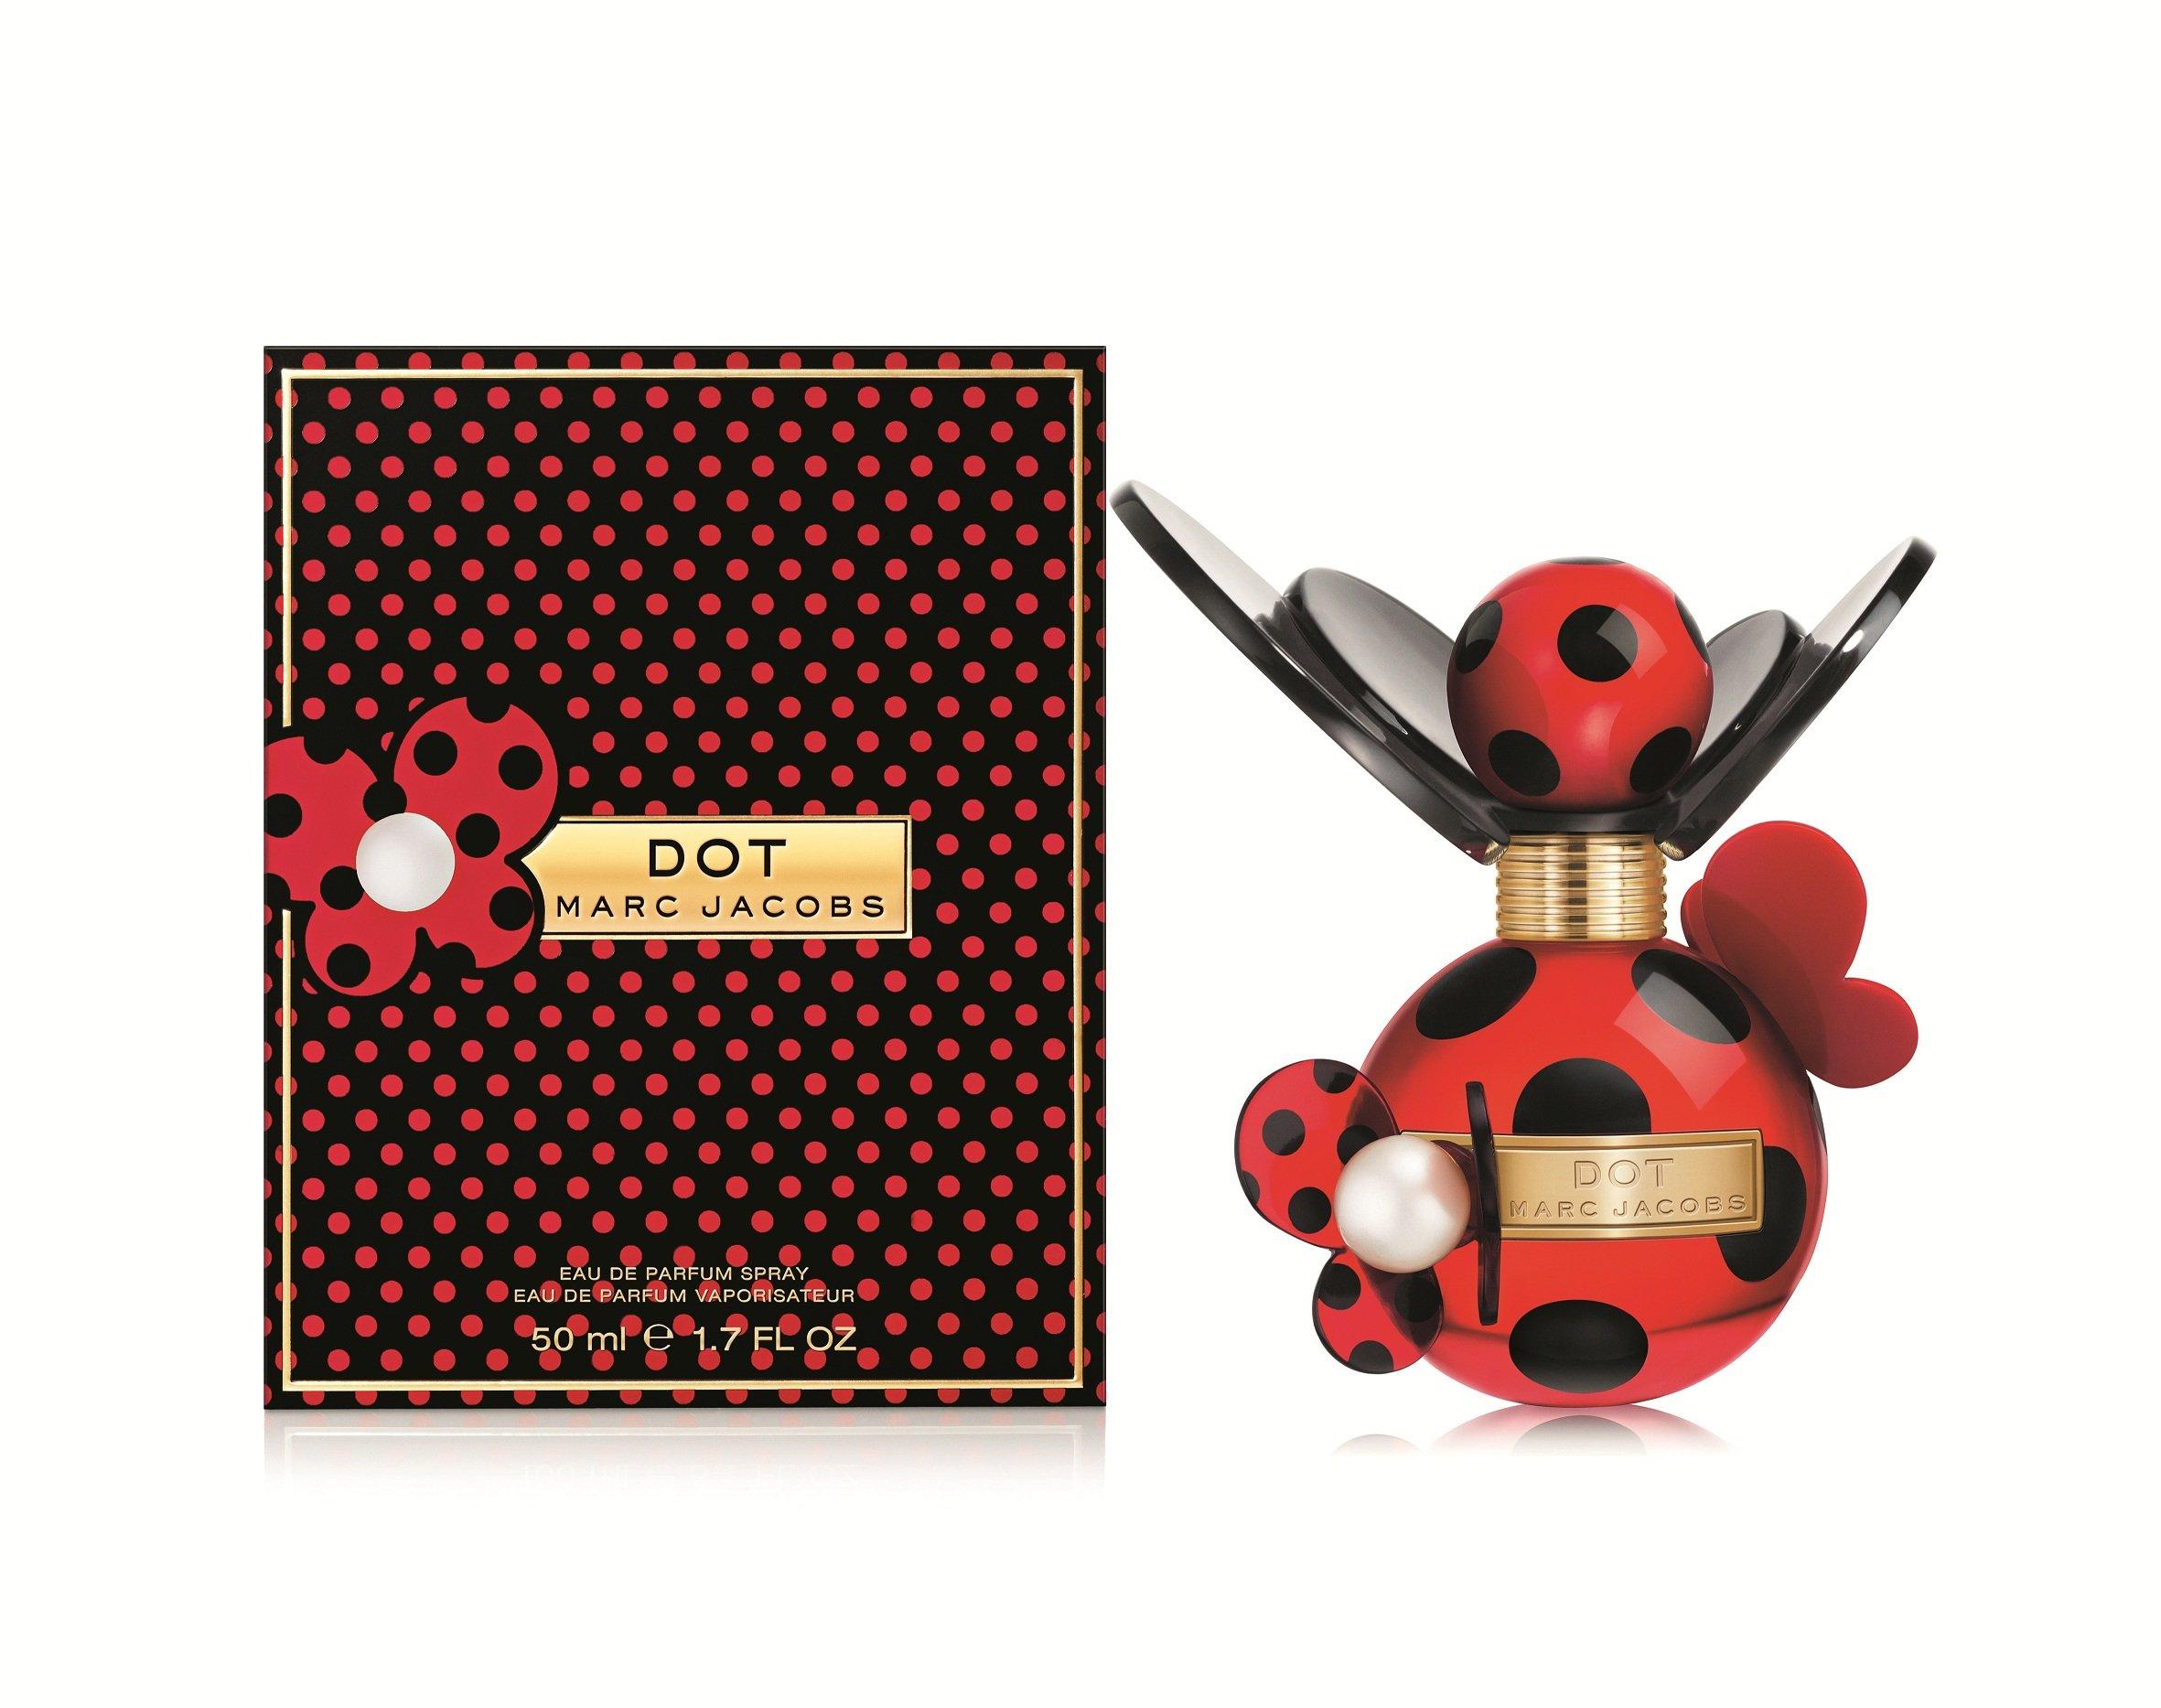 Marc Jacobs Dot Eau de Parfum Spray for Women, 1.11 Ounce